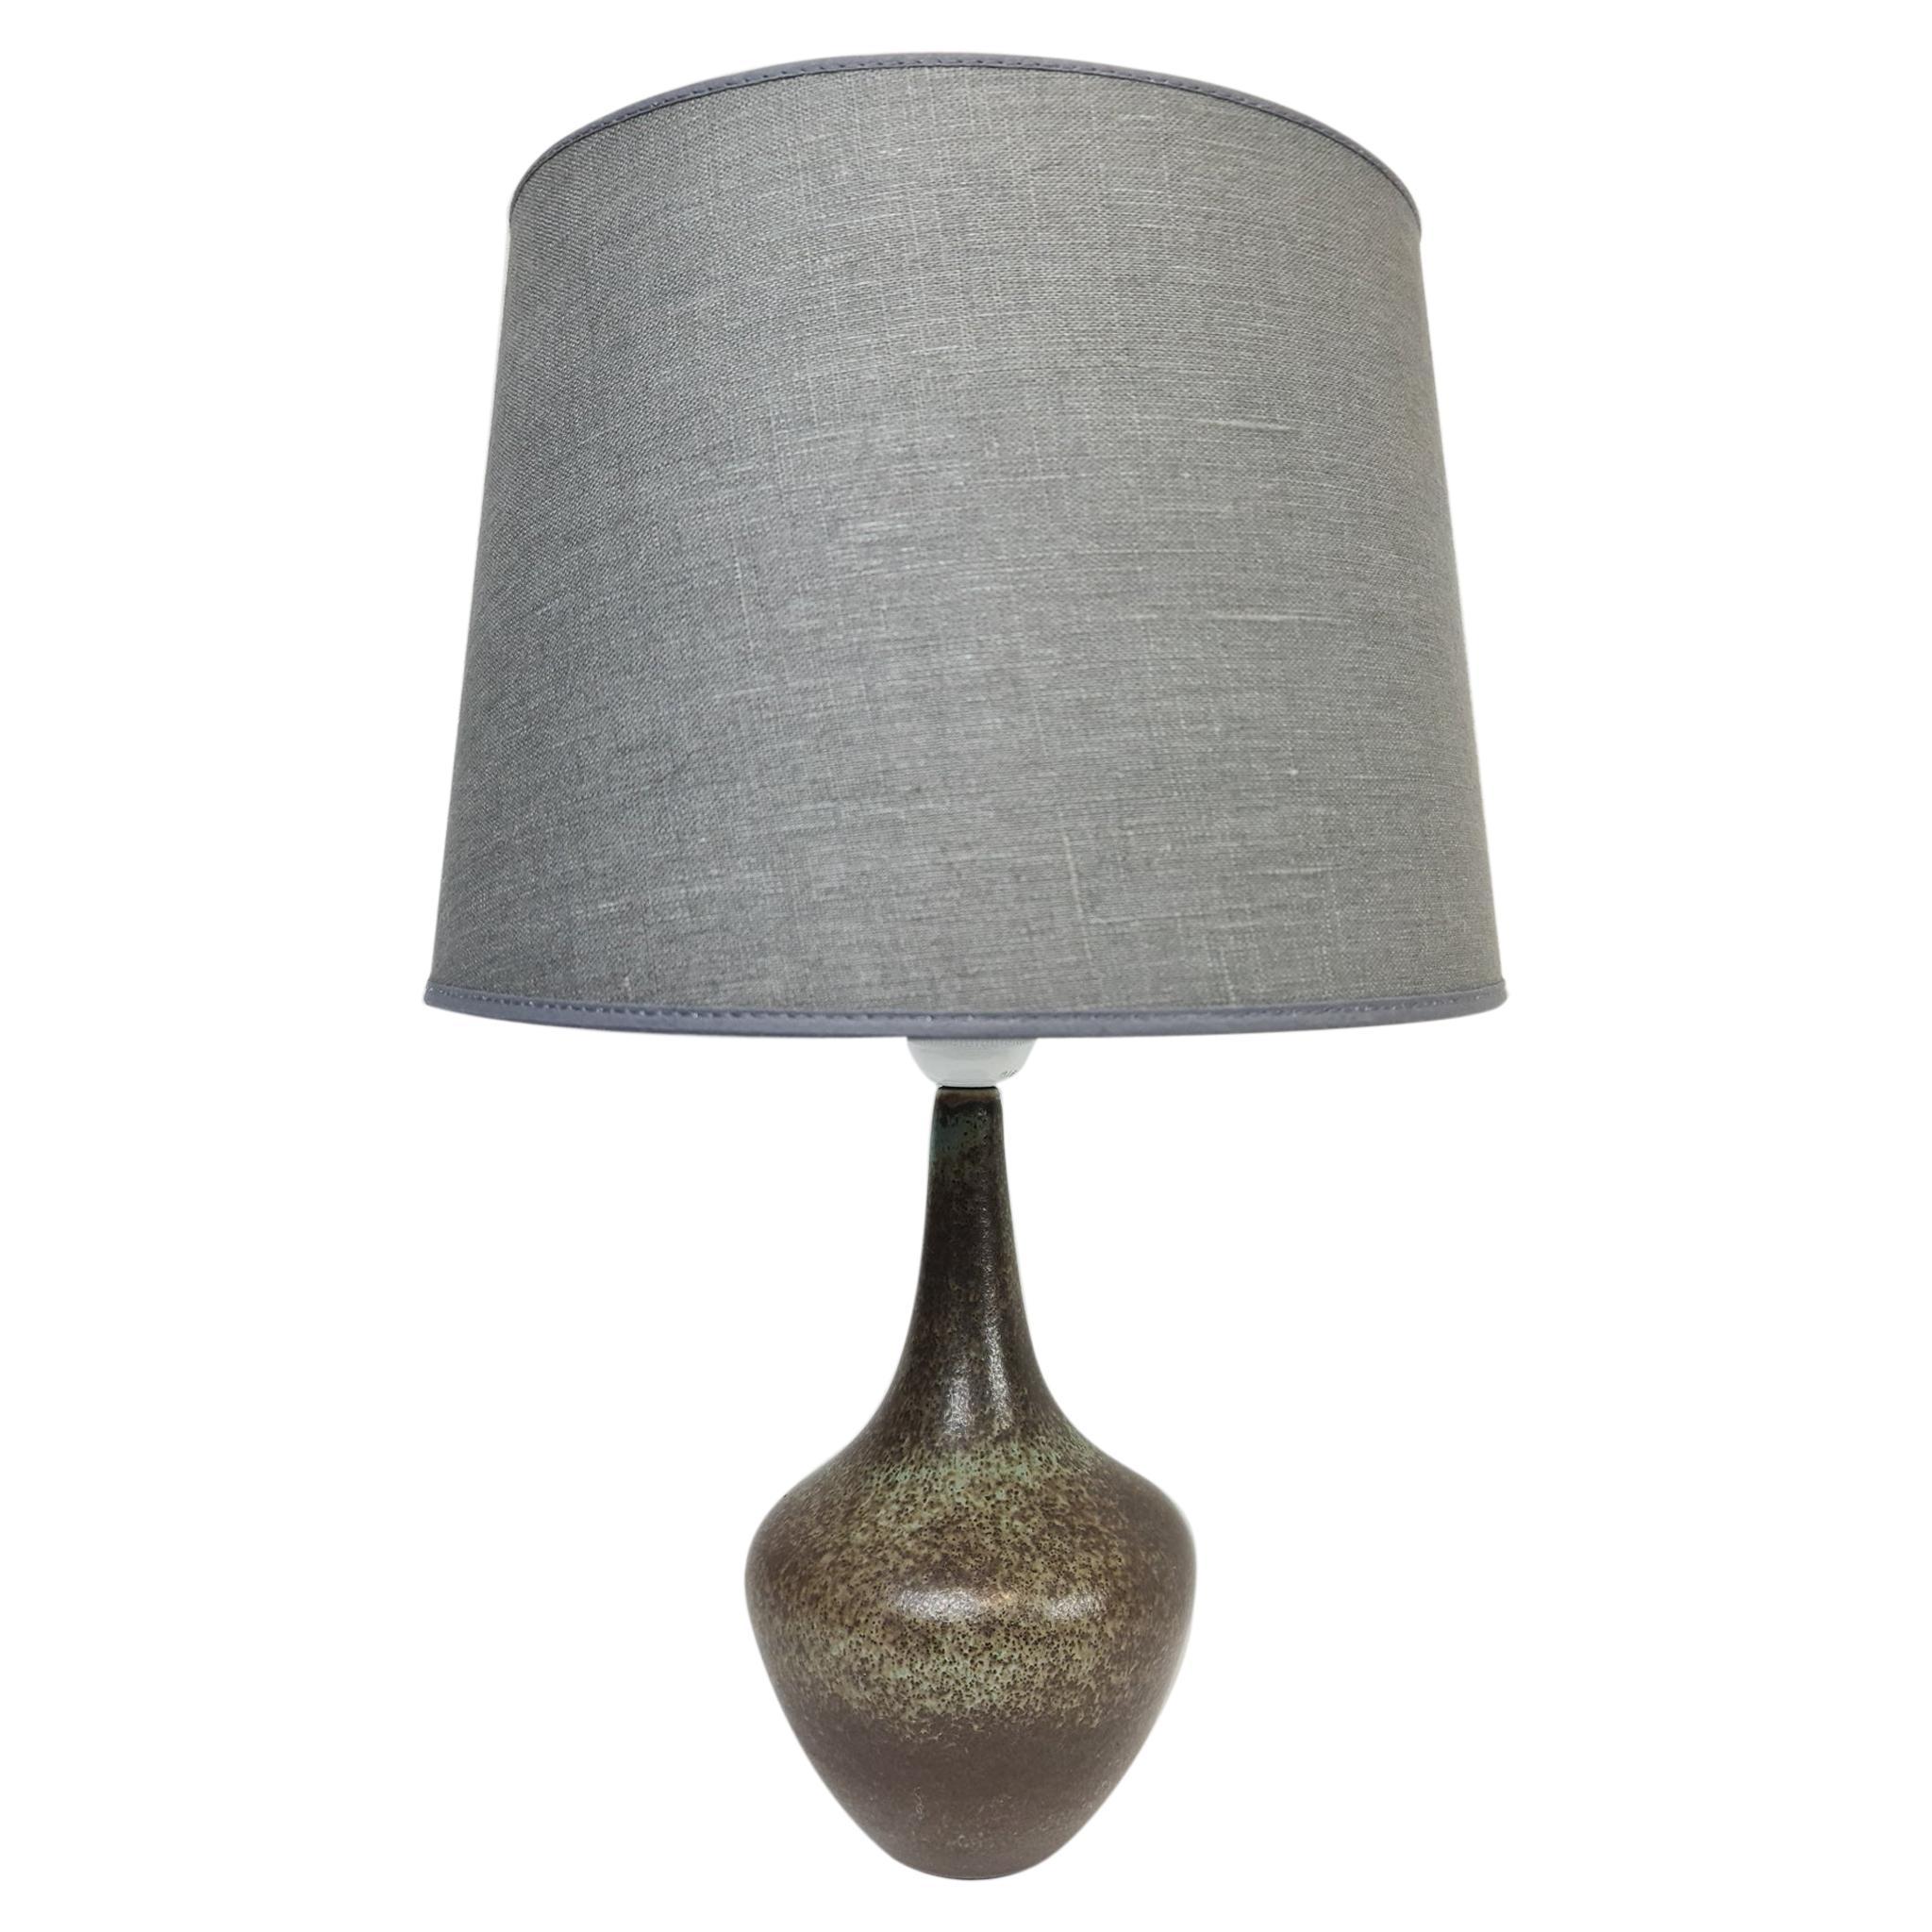 Swedish Midcentury Ceramic Table Lamp by Gunnar Nylund Rörstrand